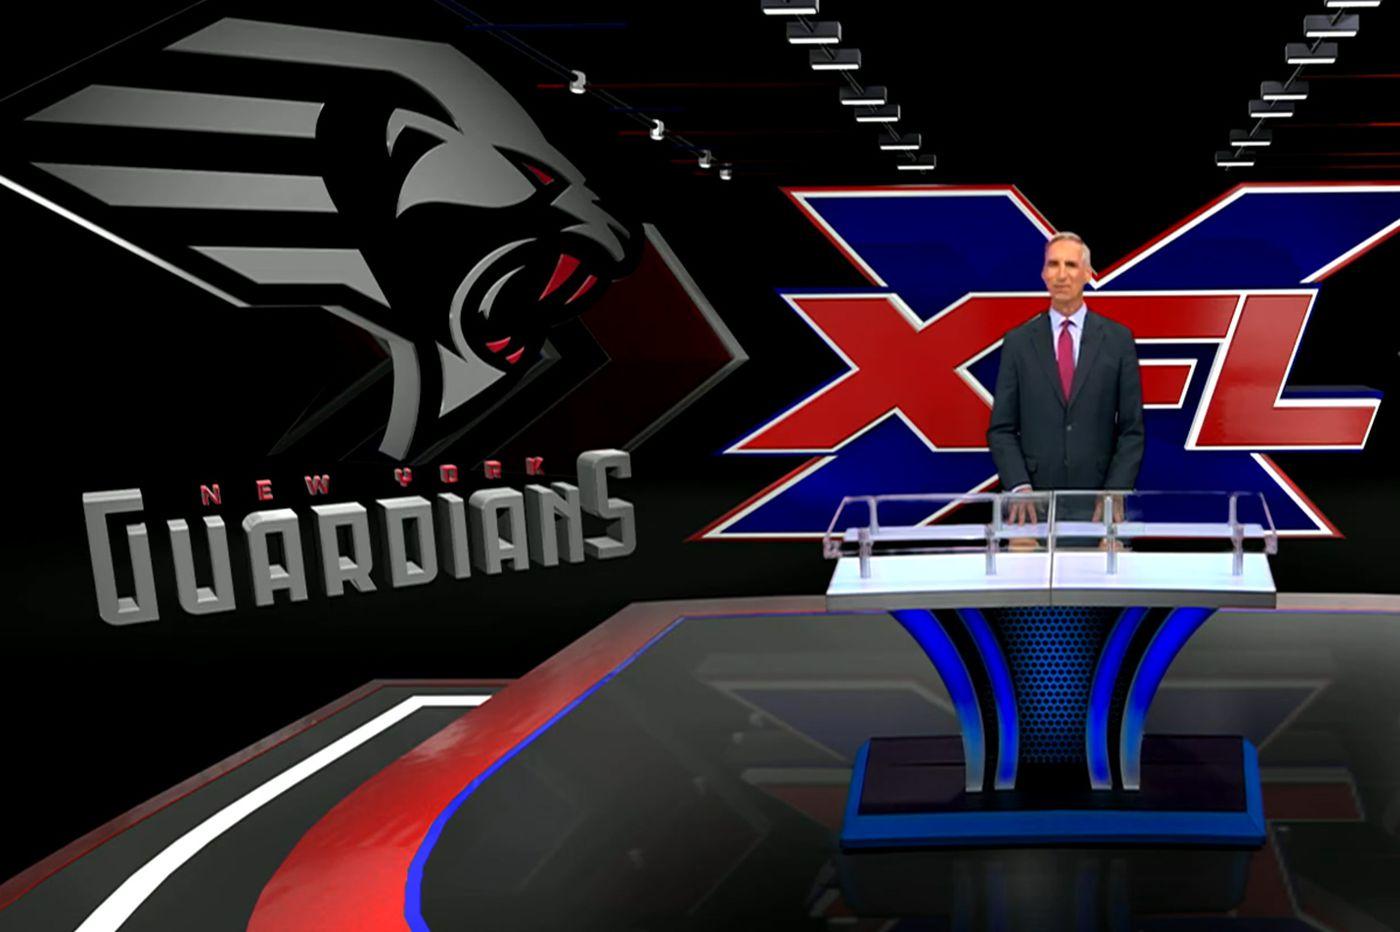 The XFL reveals team names, logos ahead of league's 2020 relaunch